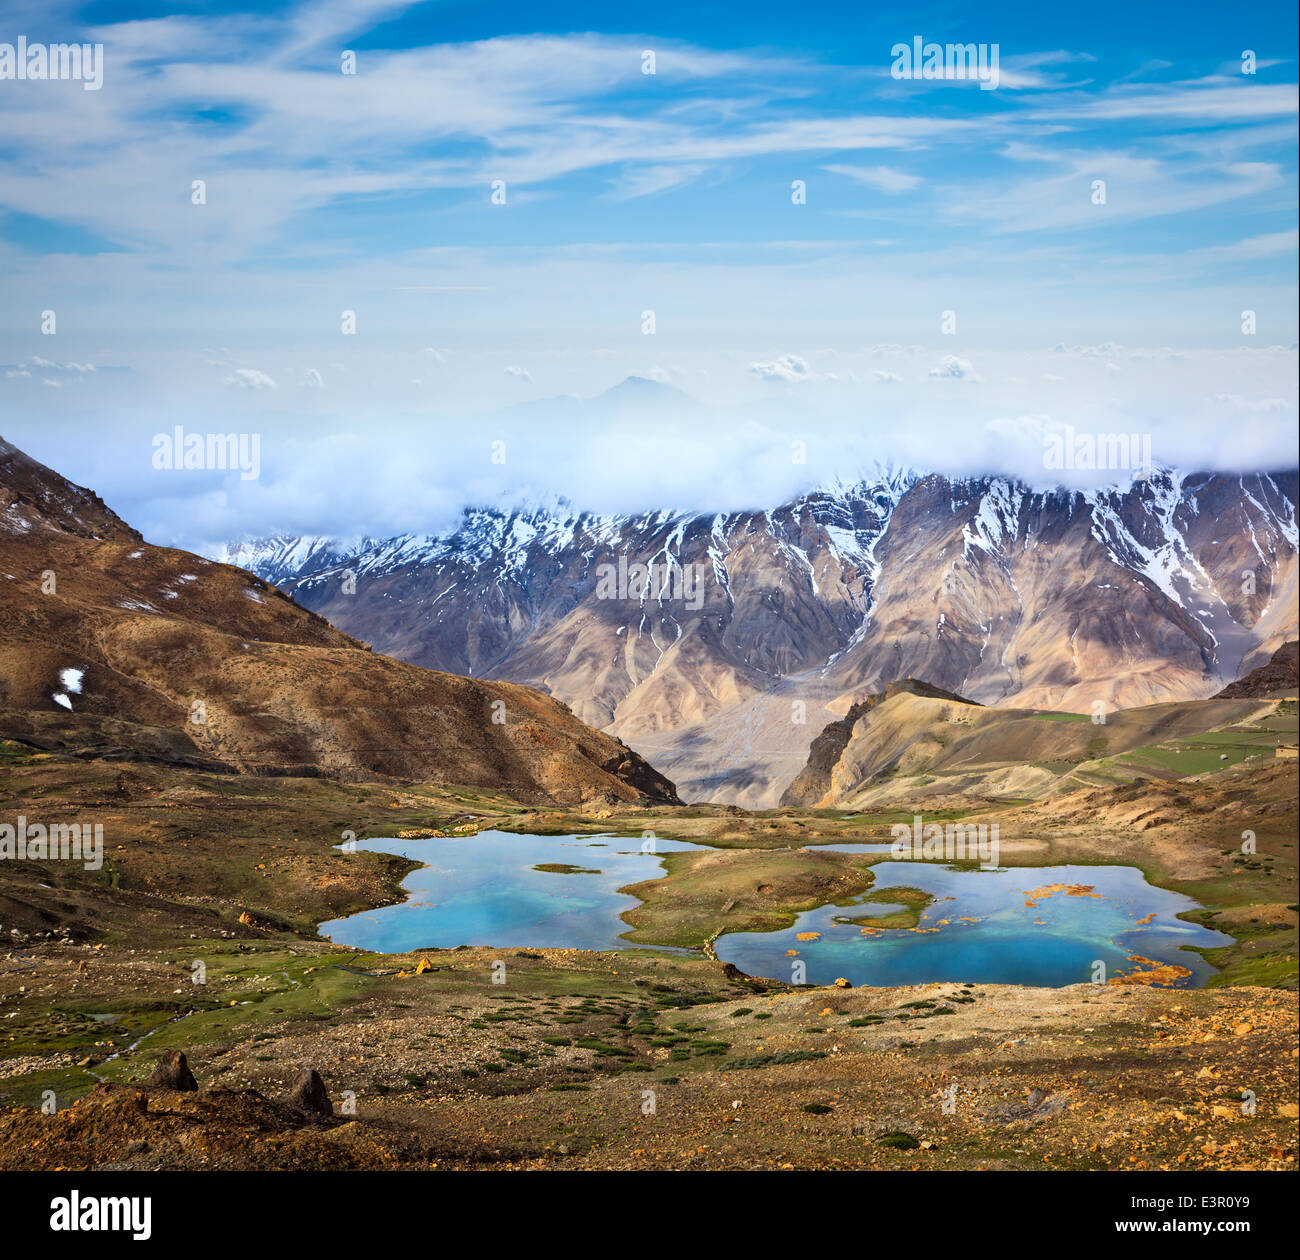 Mountain lakes in Spiti Valley in Himalayas. Himachal Pradesh, India - Stock Image